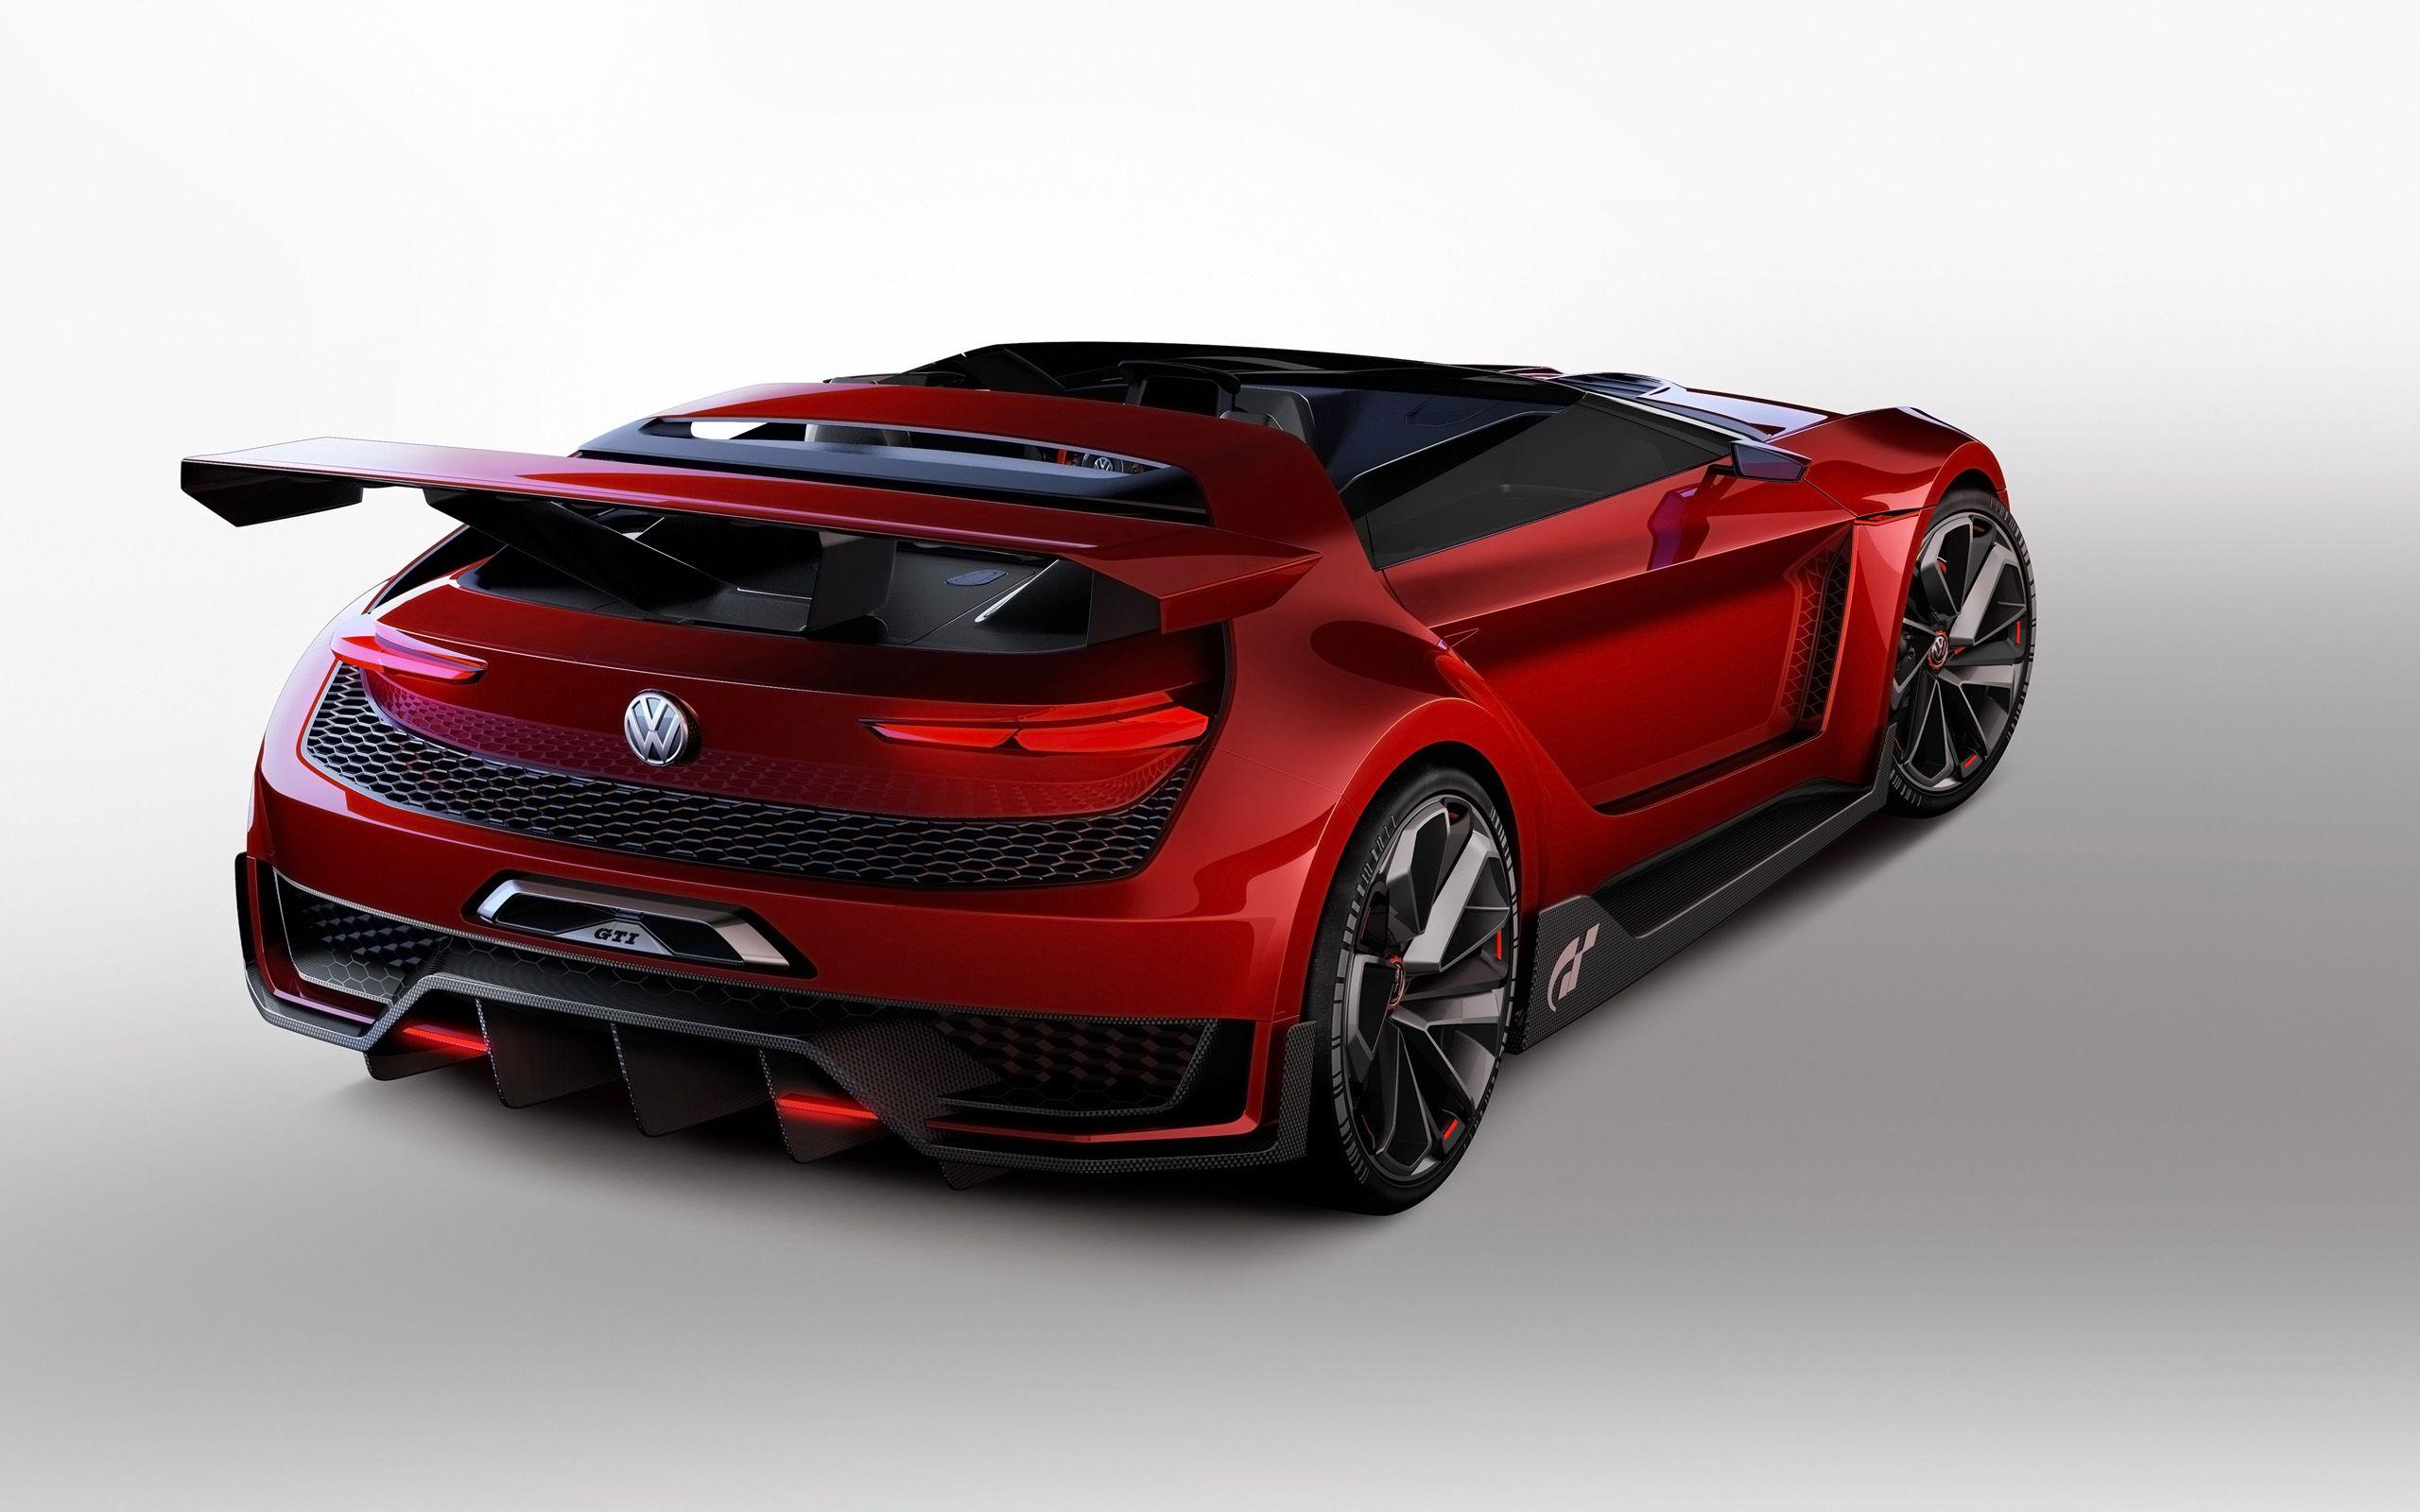 Volkswagen GTI Roadster - Vision Gran Turismo